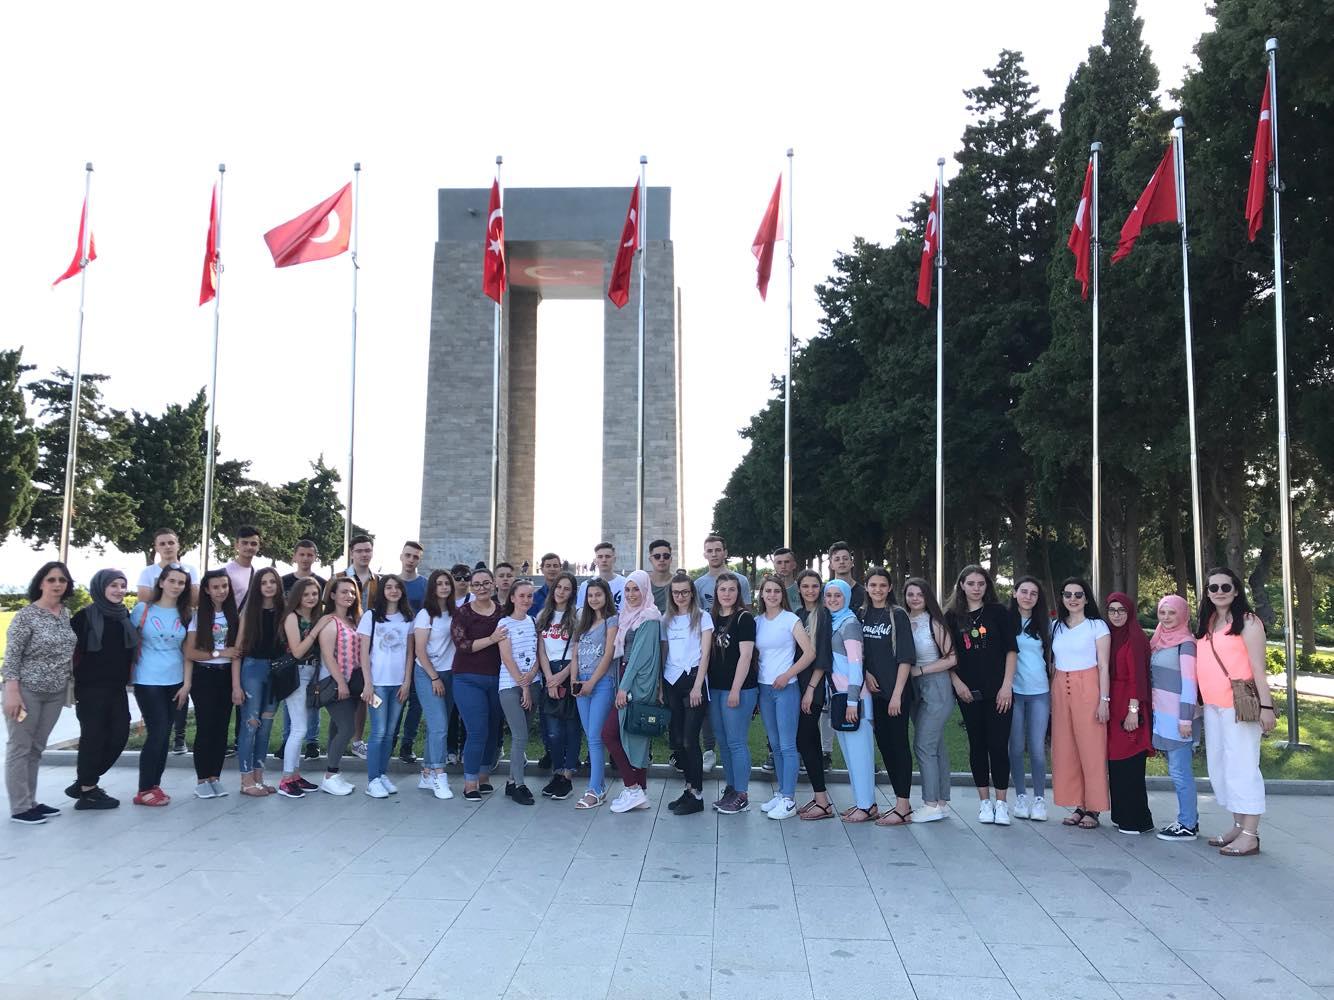 Çanakkale, İzmir,Manisa Kültürel Gezisi 2019